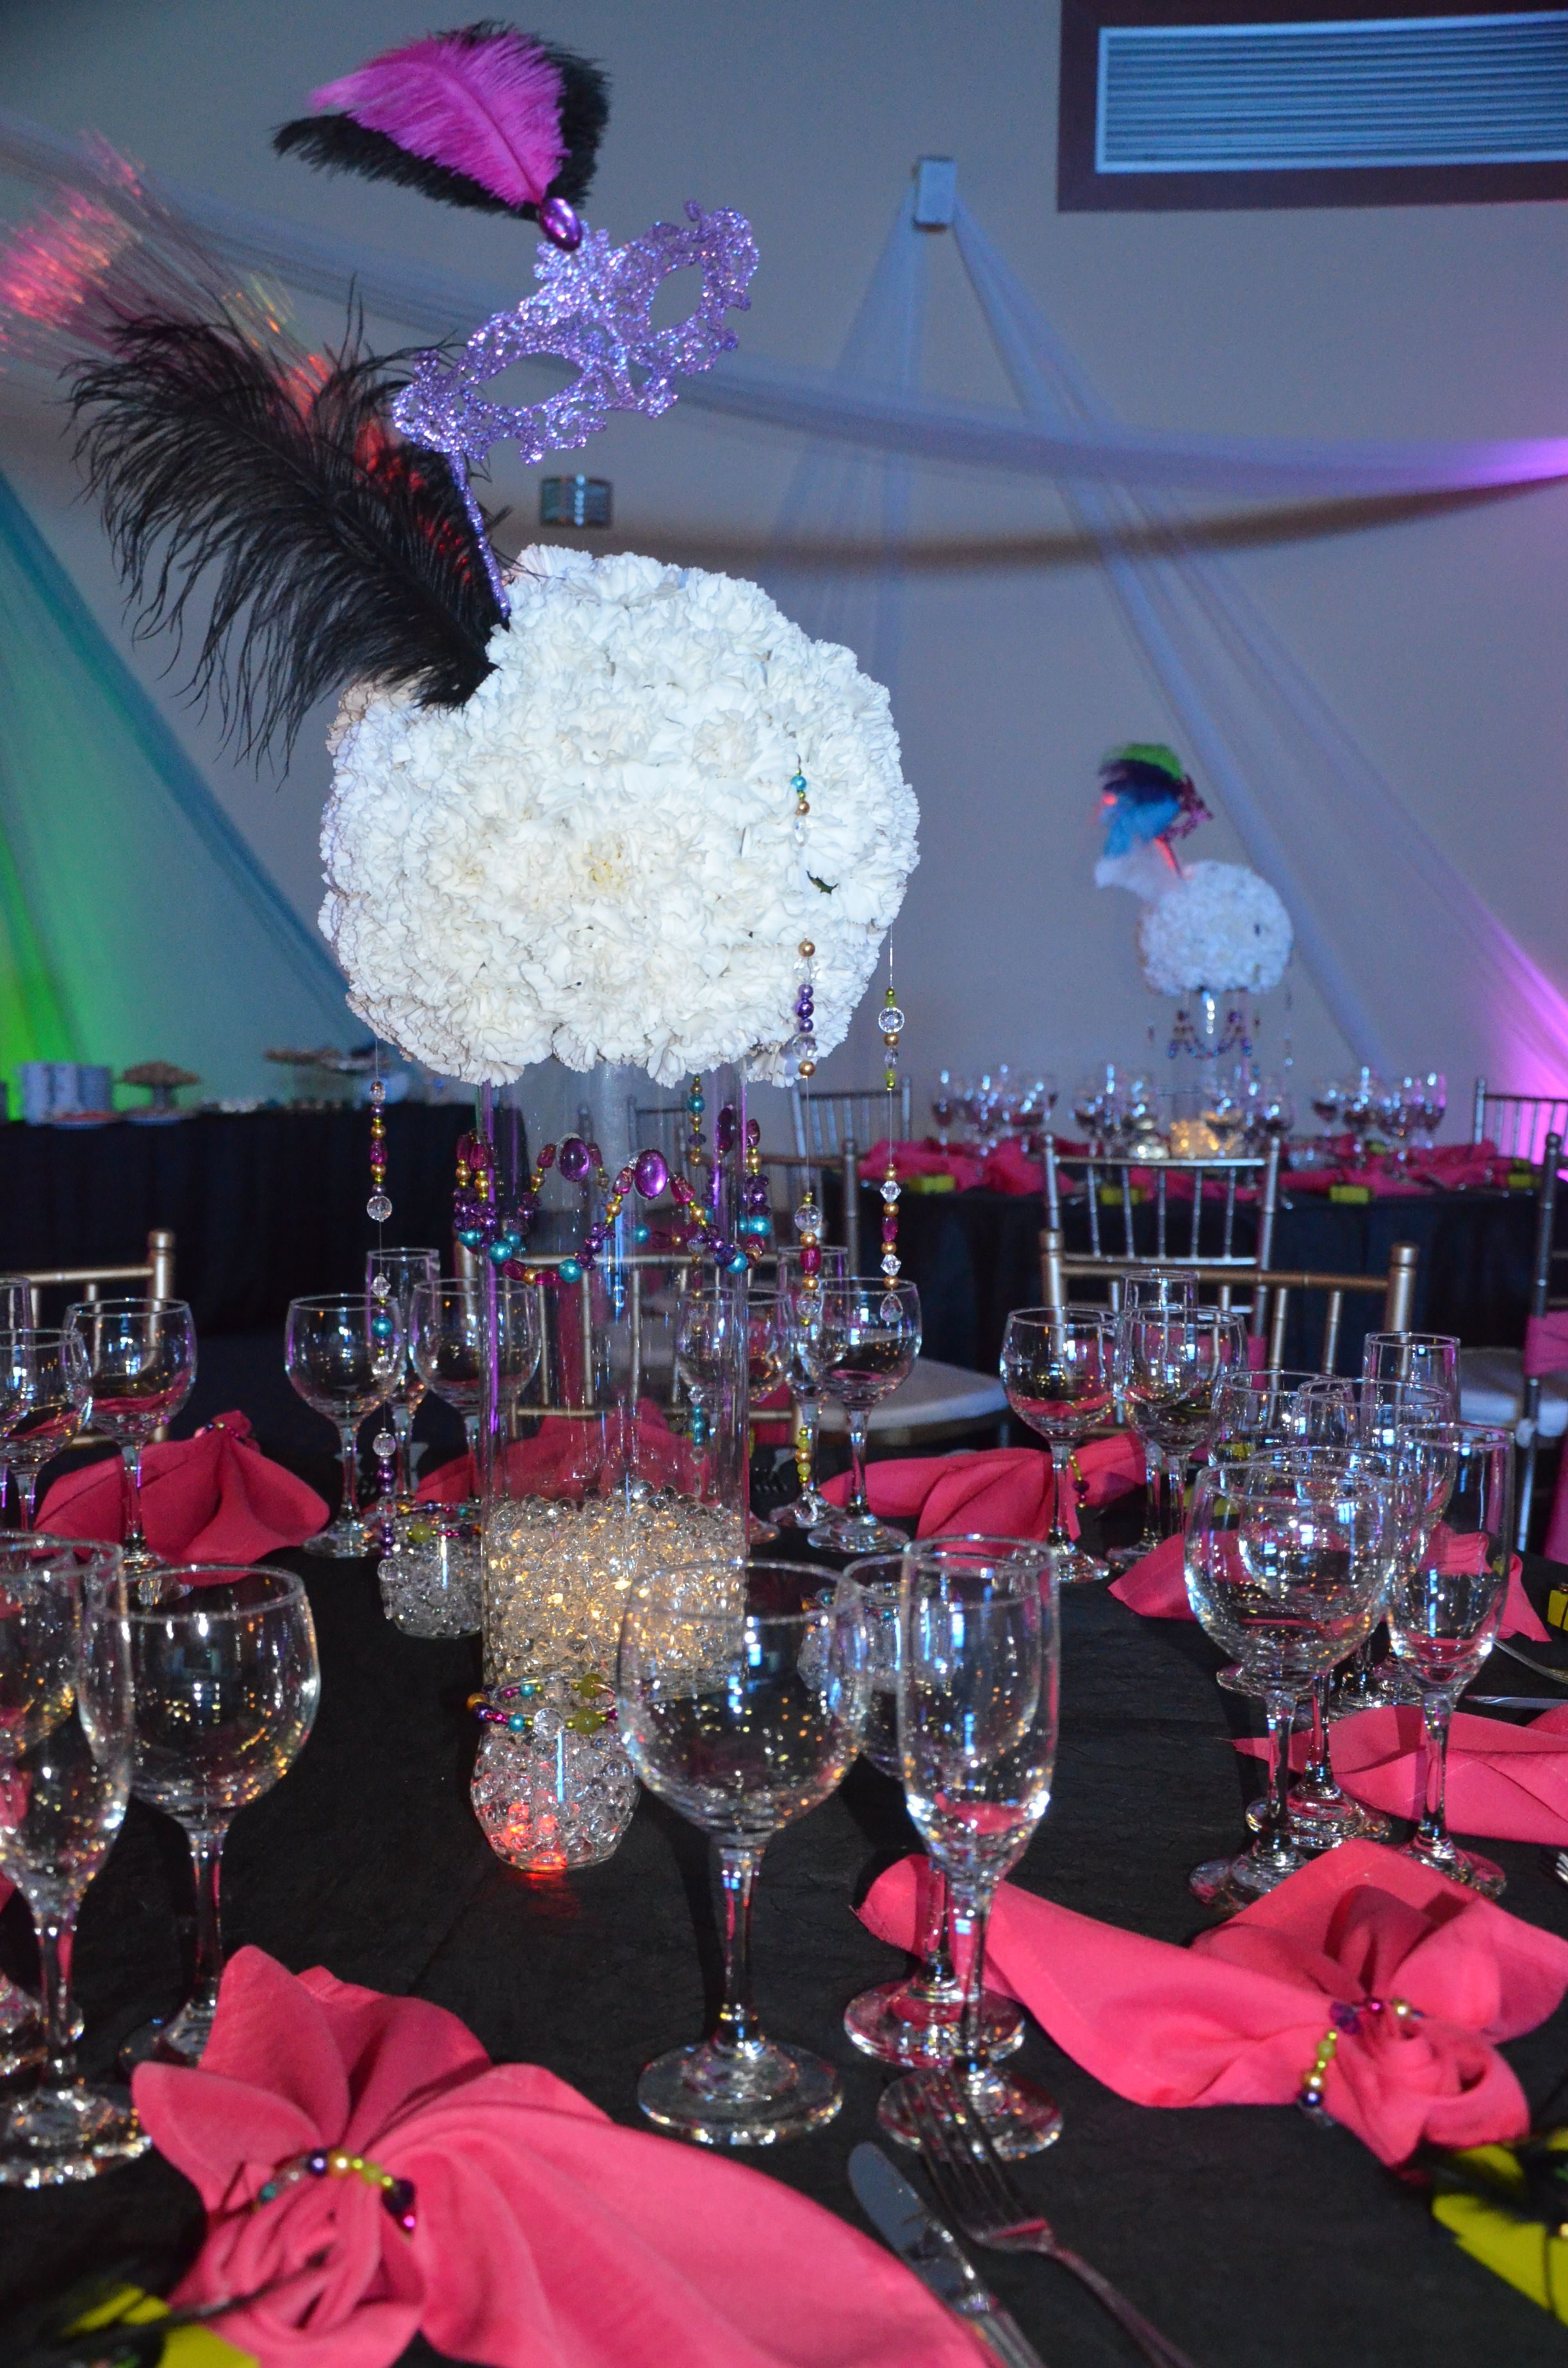 centro de mesa  esfera de flores naturales con collares